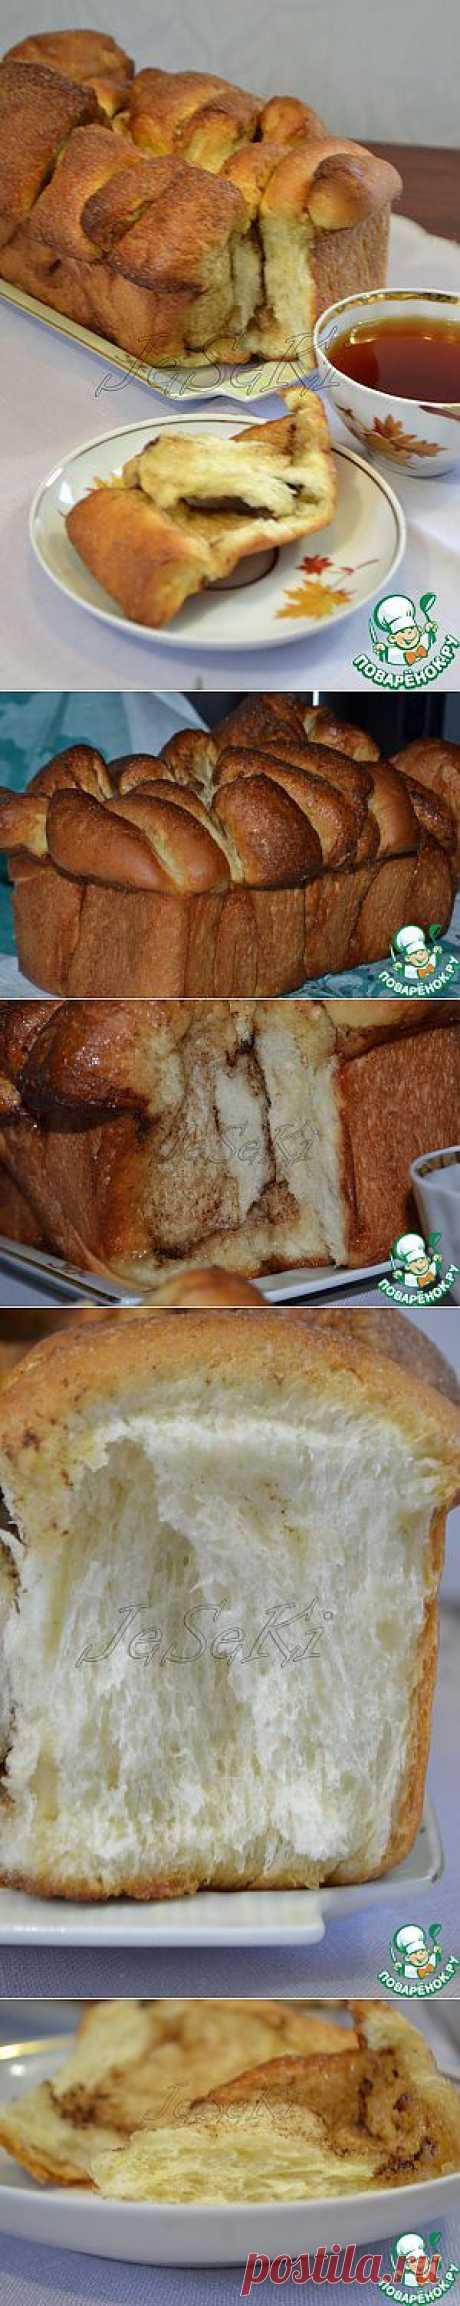 Airy bread with cinnamon - the culinary recipe